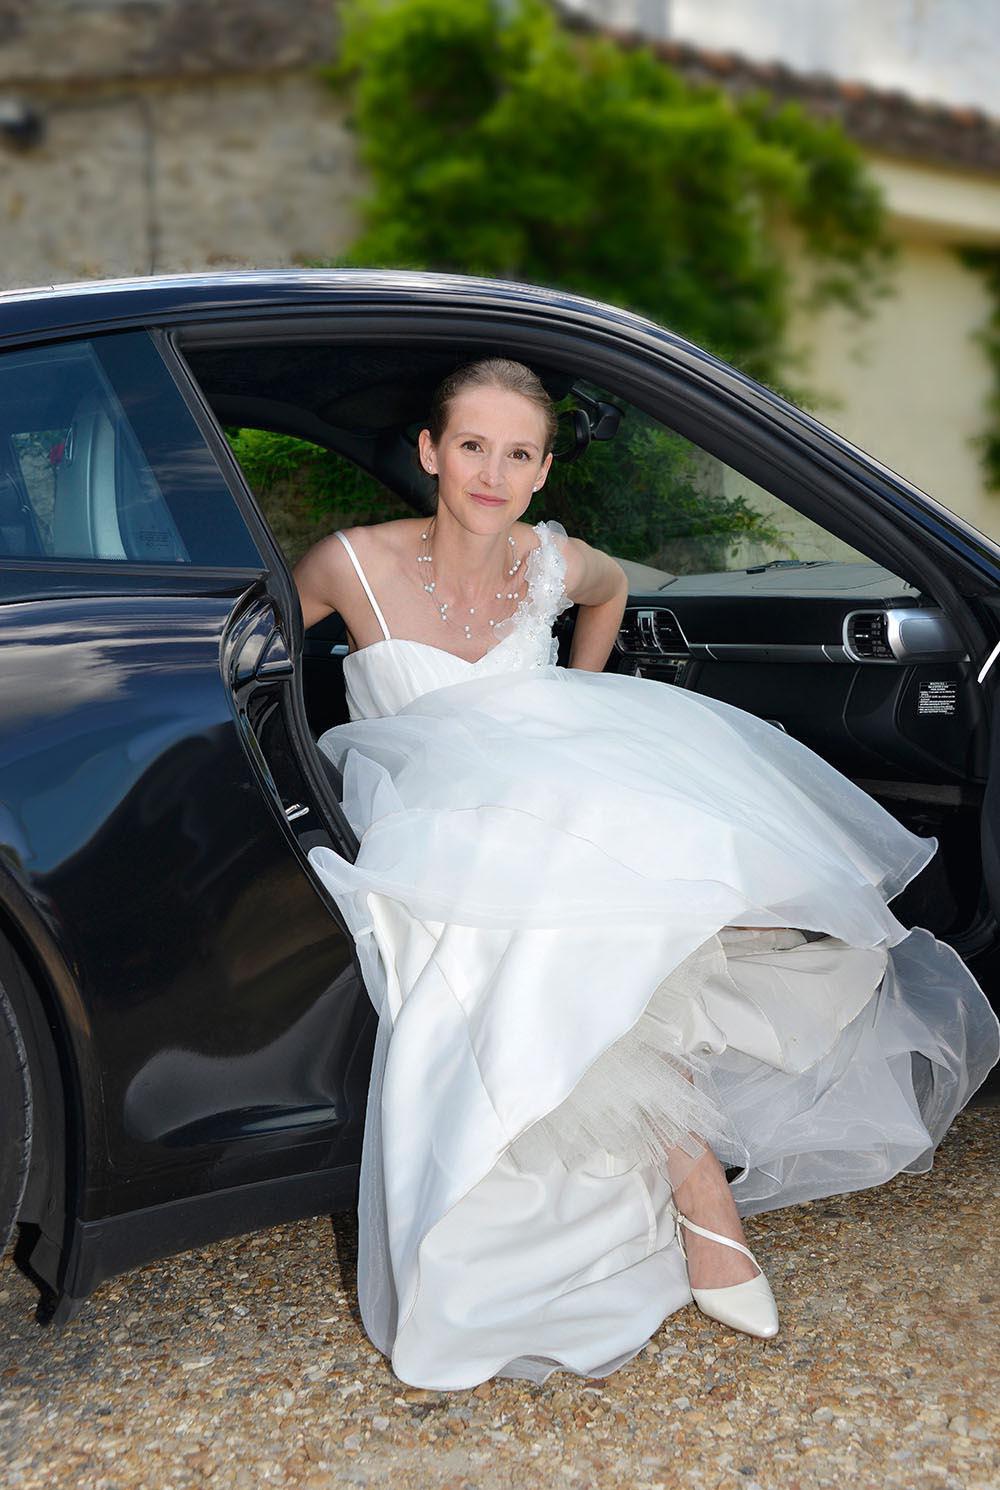 Mariee en robe de mariage sortant de la voiture